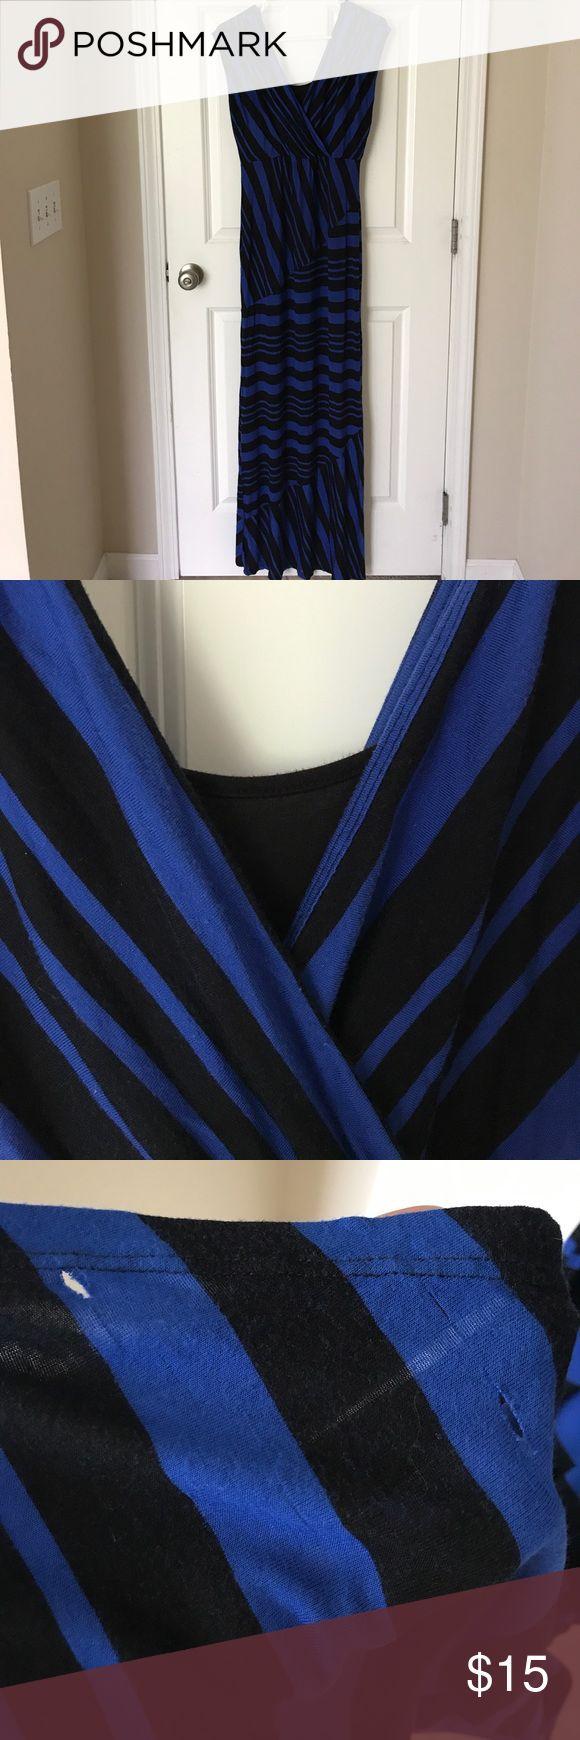 Best 20 striped maternity dresses ideas on pinterest summer motherhood maternity maxi dress ombrellifo Choice Image